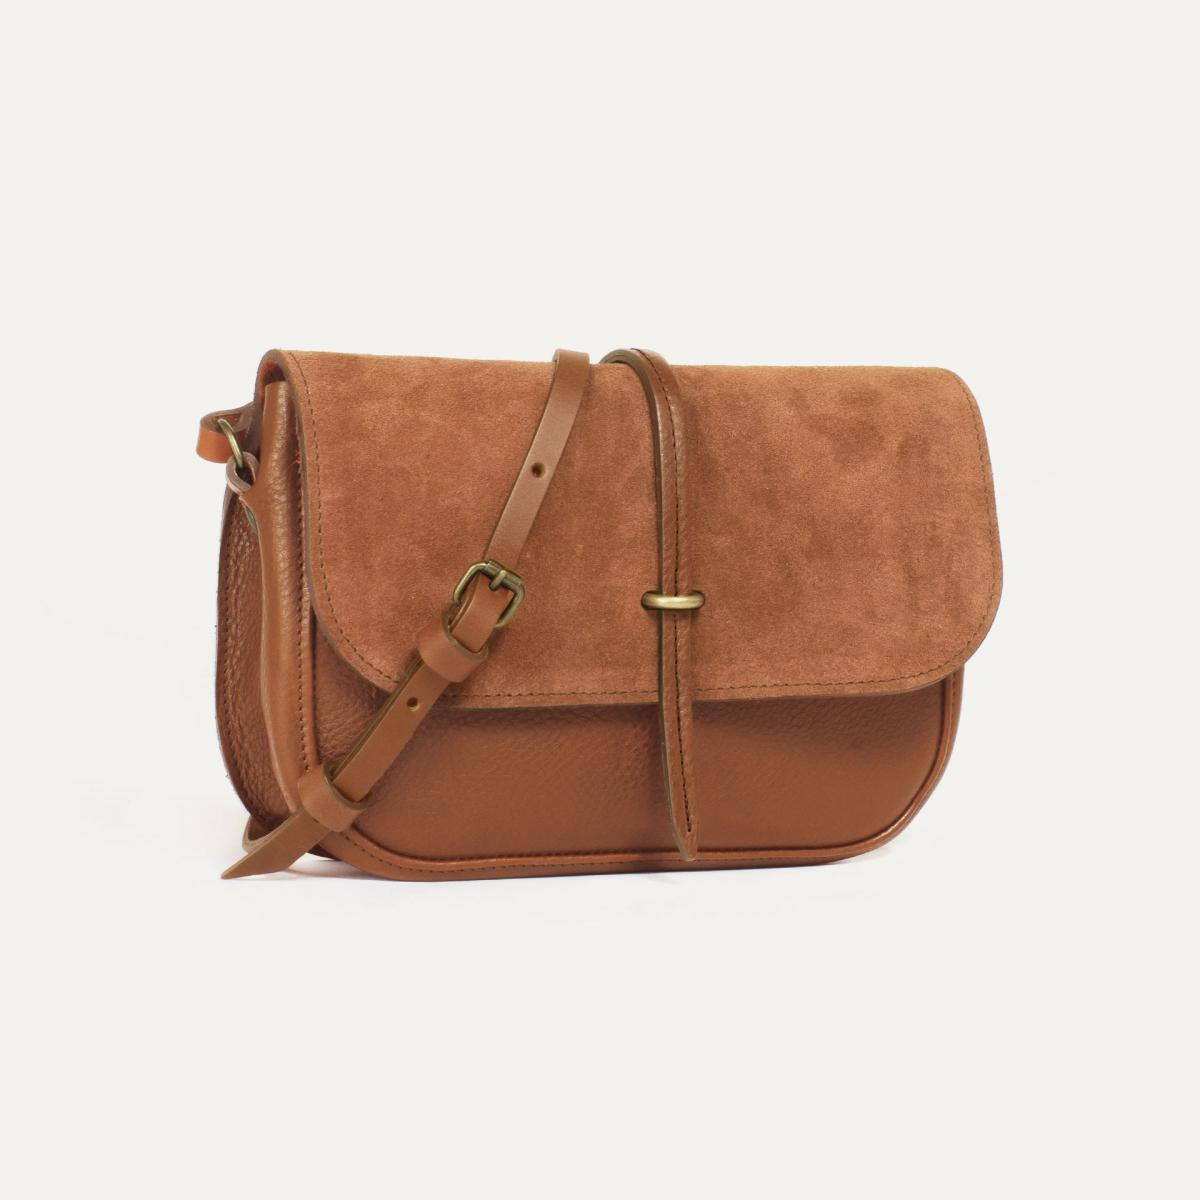 Pastis handbag - Havana / Mix (image n°2)